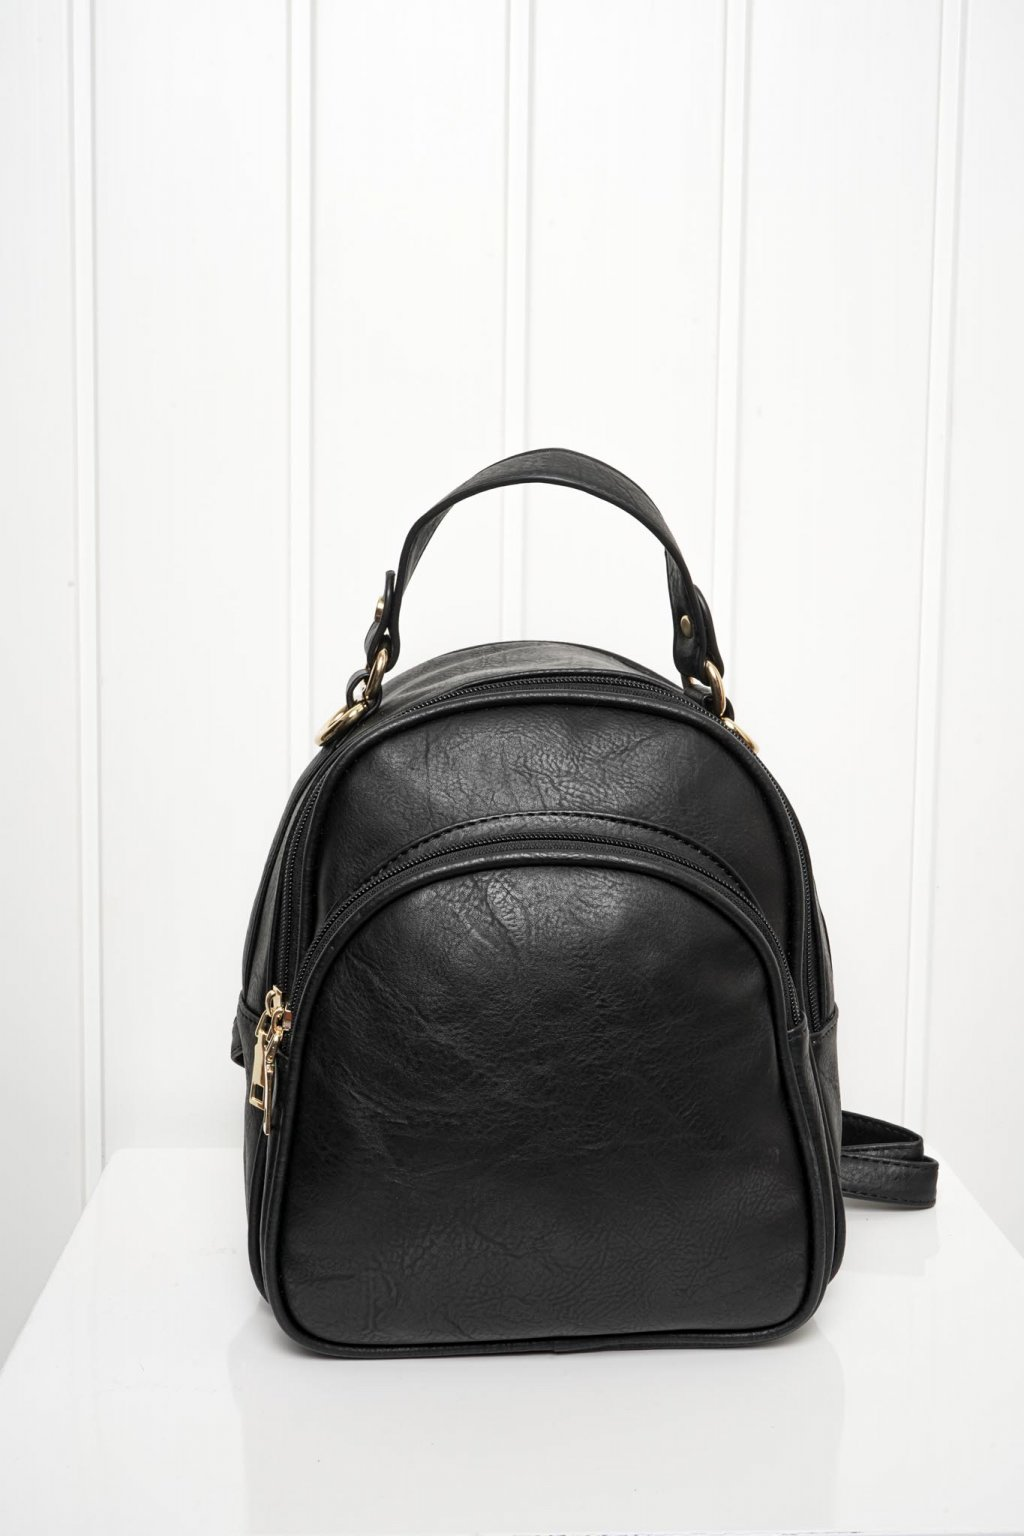 Kabelka, crossbody, ruksak, shopping bag, shopperka, 446